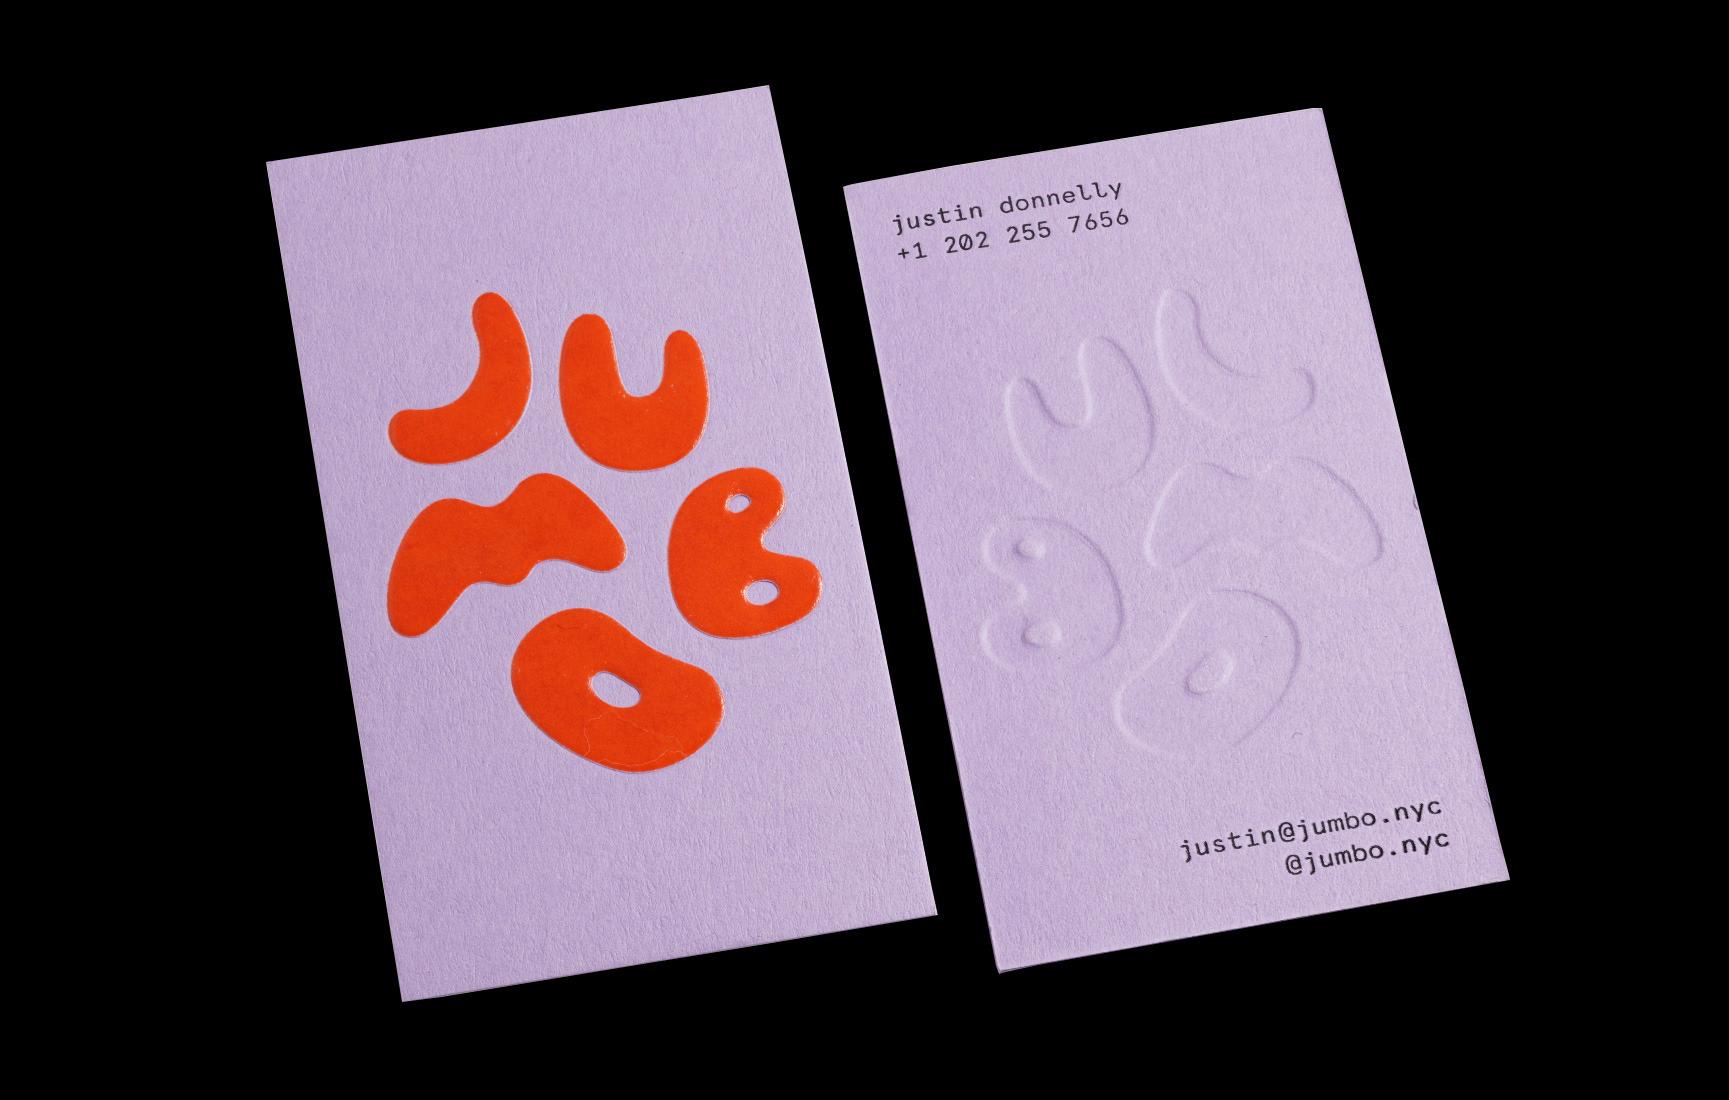 Jumbo Logo & Business Cards    Verena Michelitsch